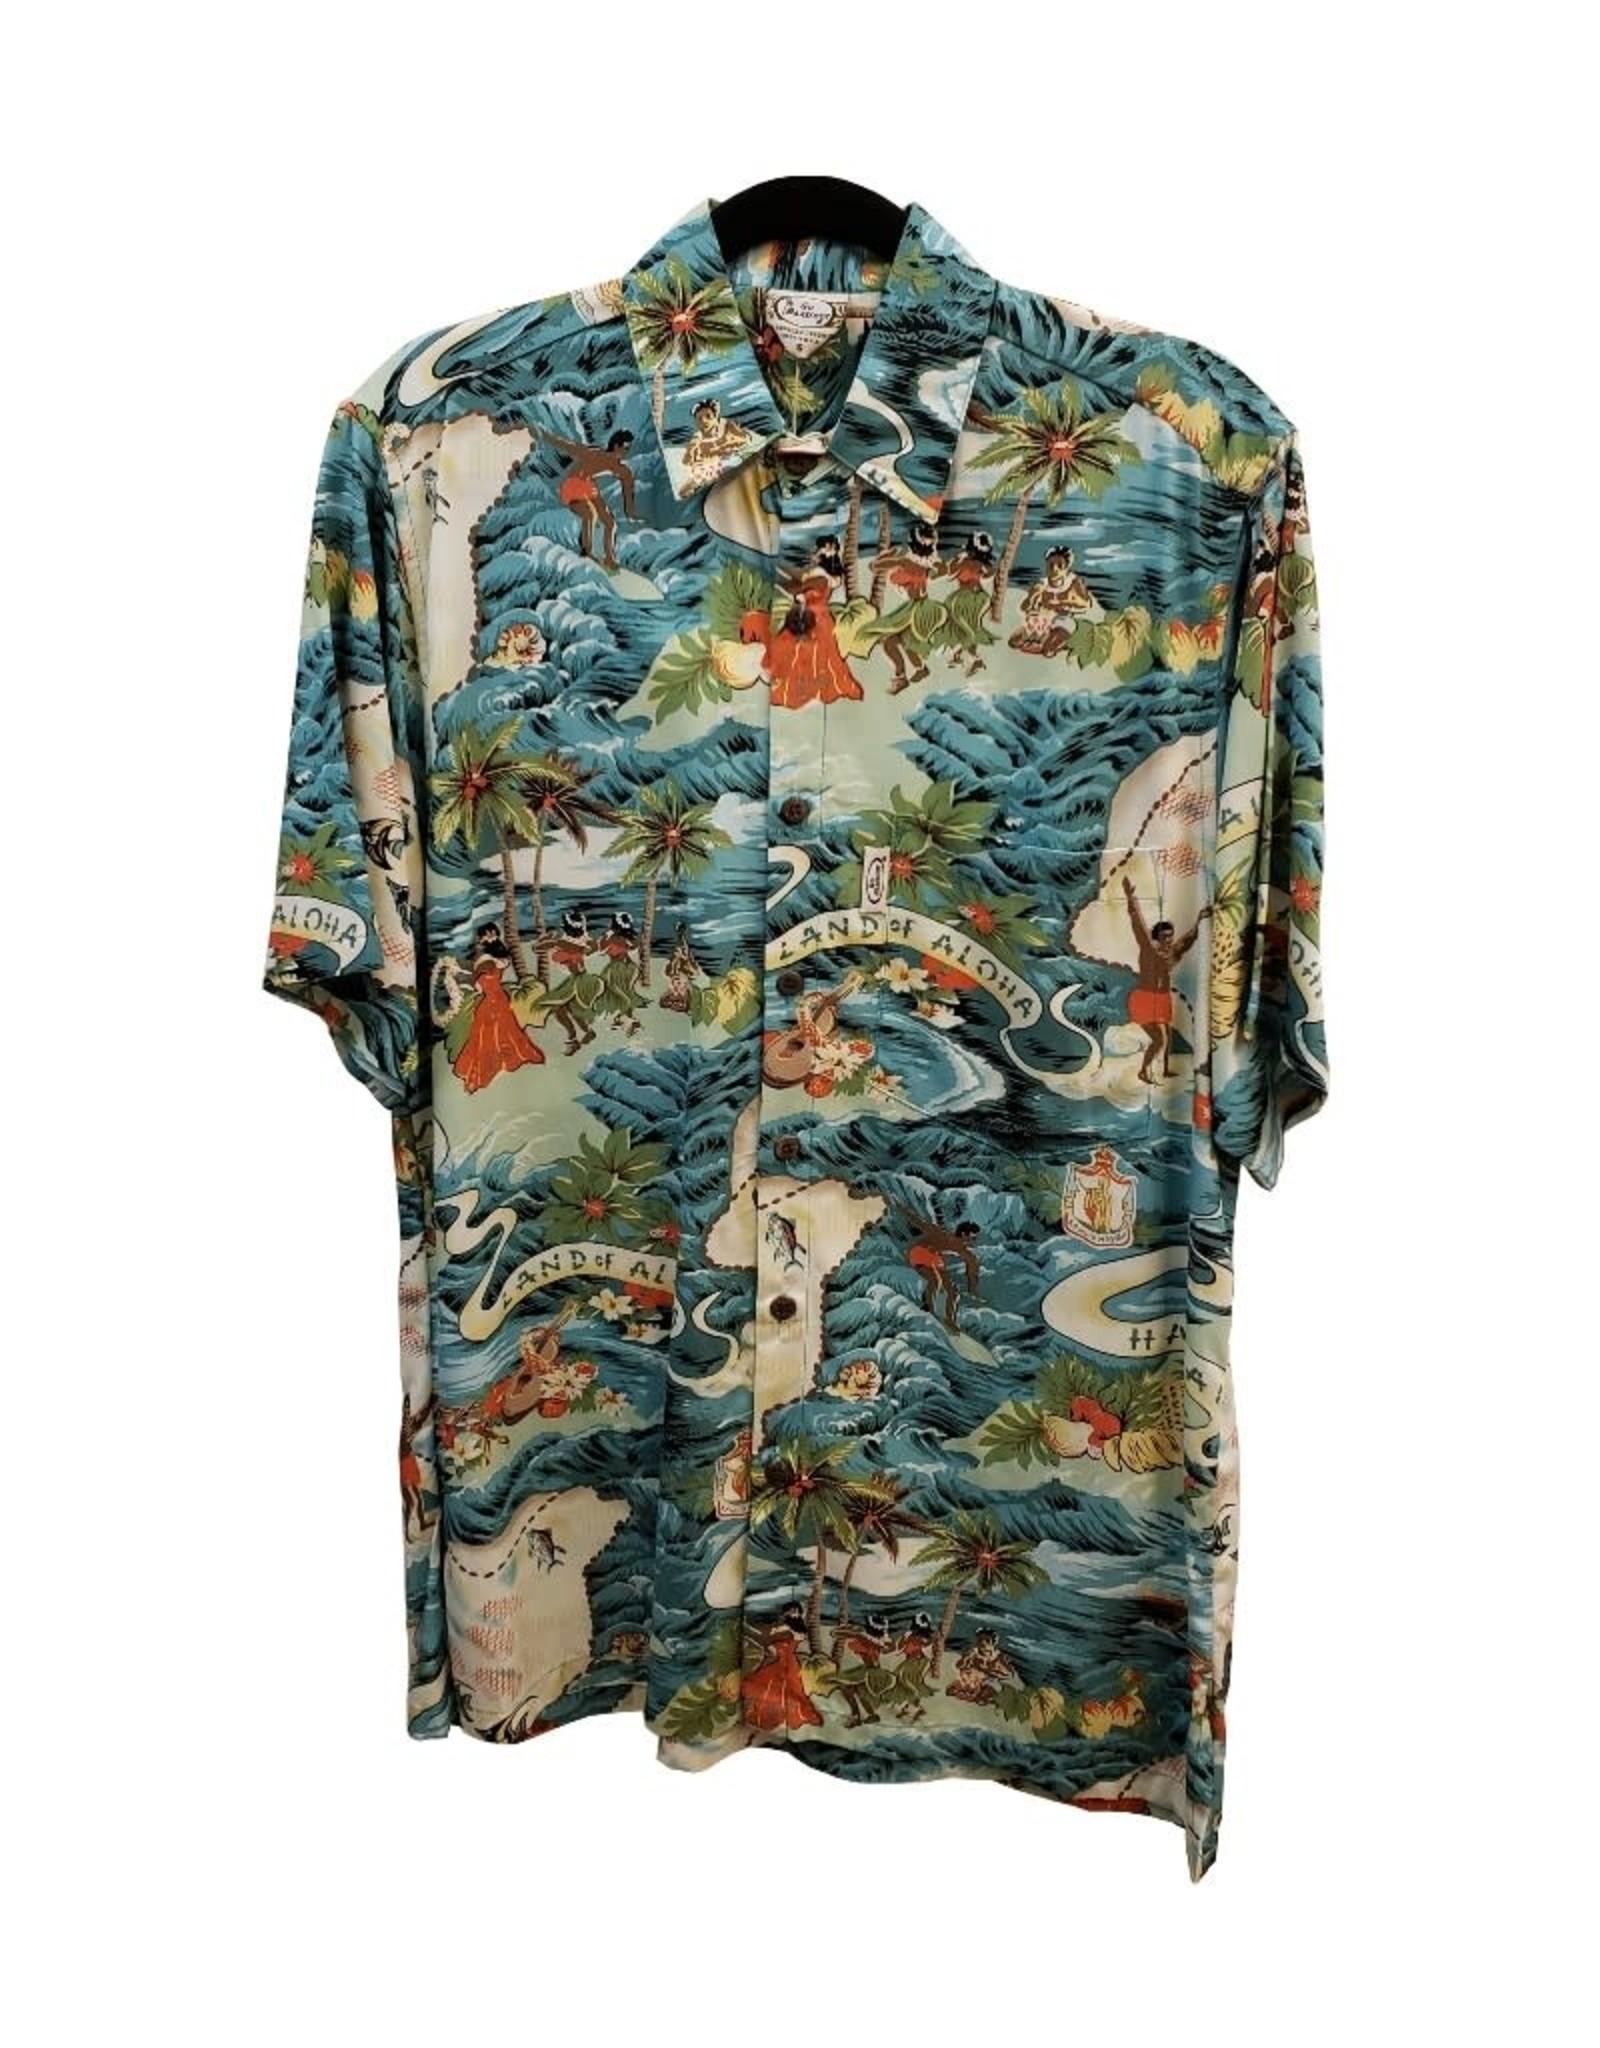 Mr. Hawaii, Inc. Mens Classic Cotton/Rayon Shirt